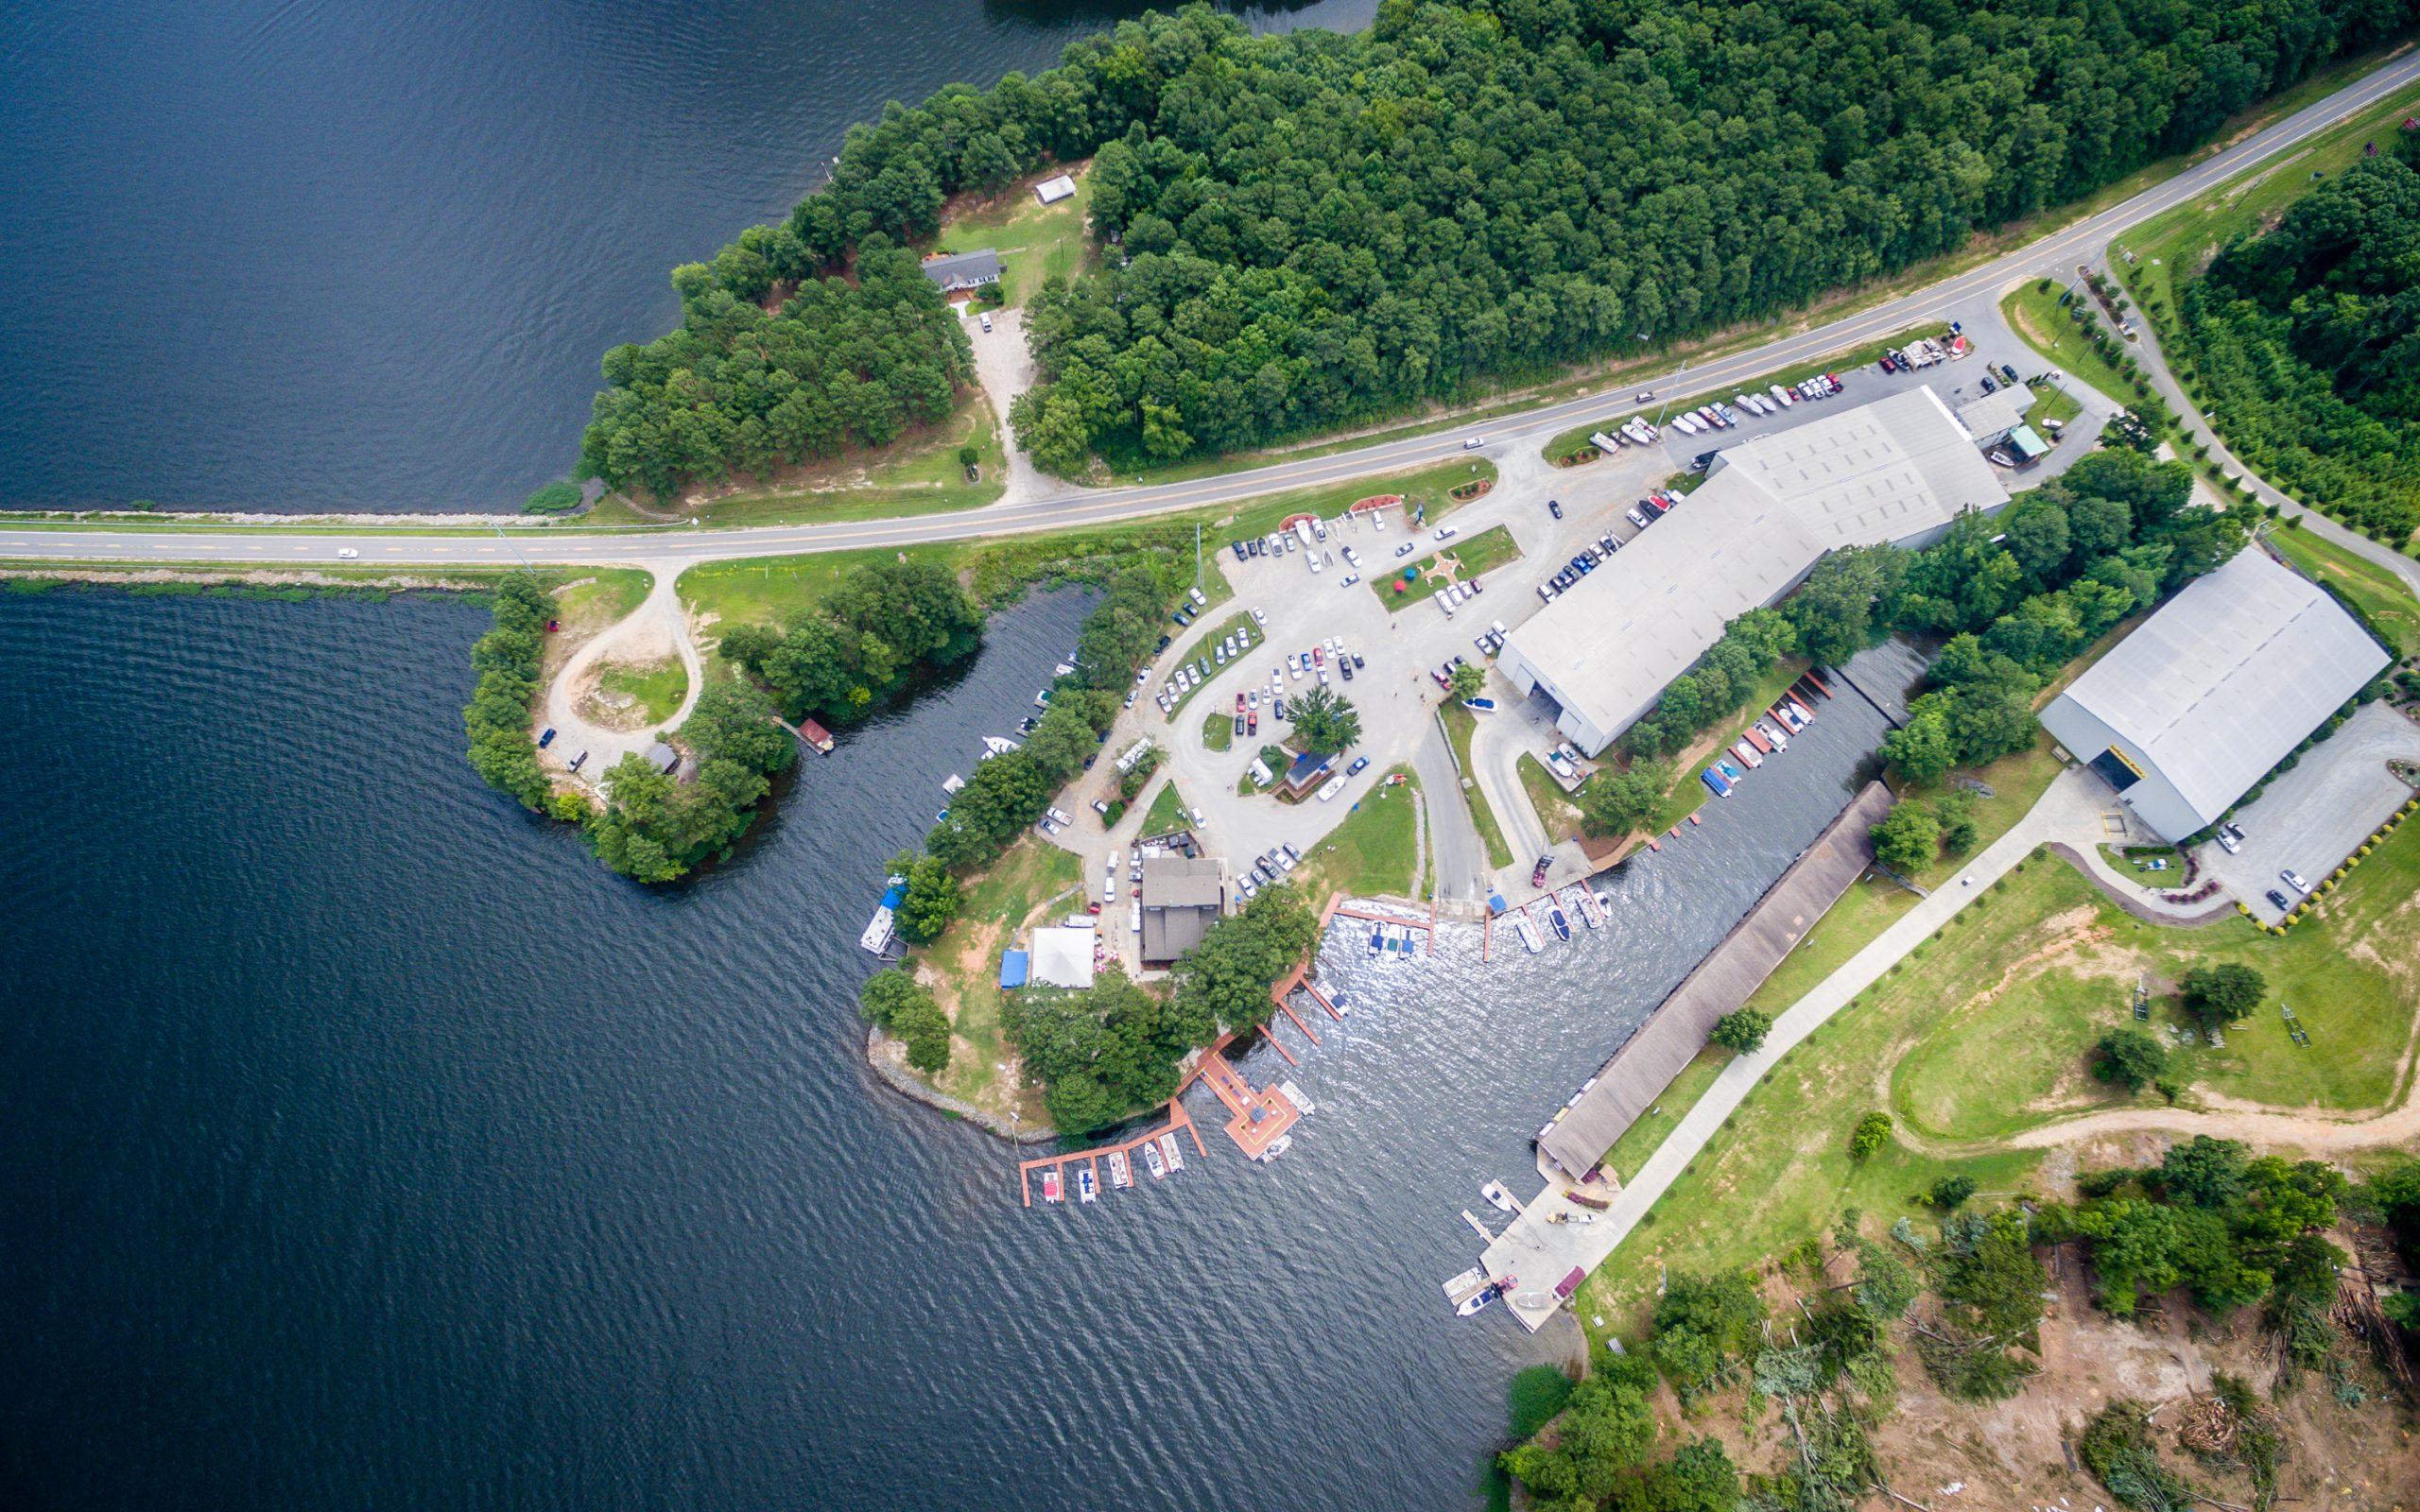 overhead view of Eaton Ferry Marina on lake Gaston